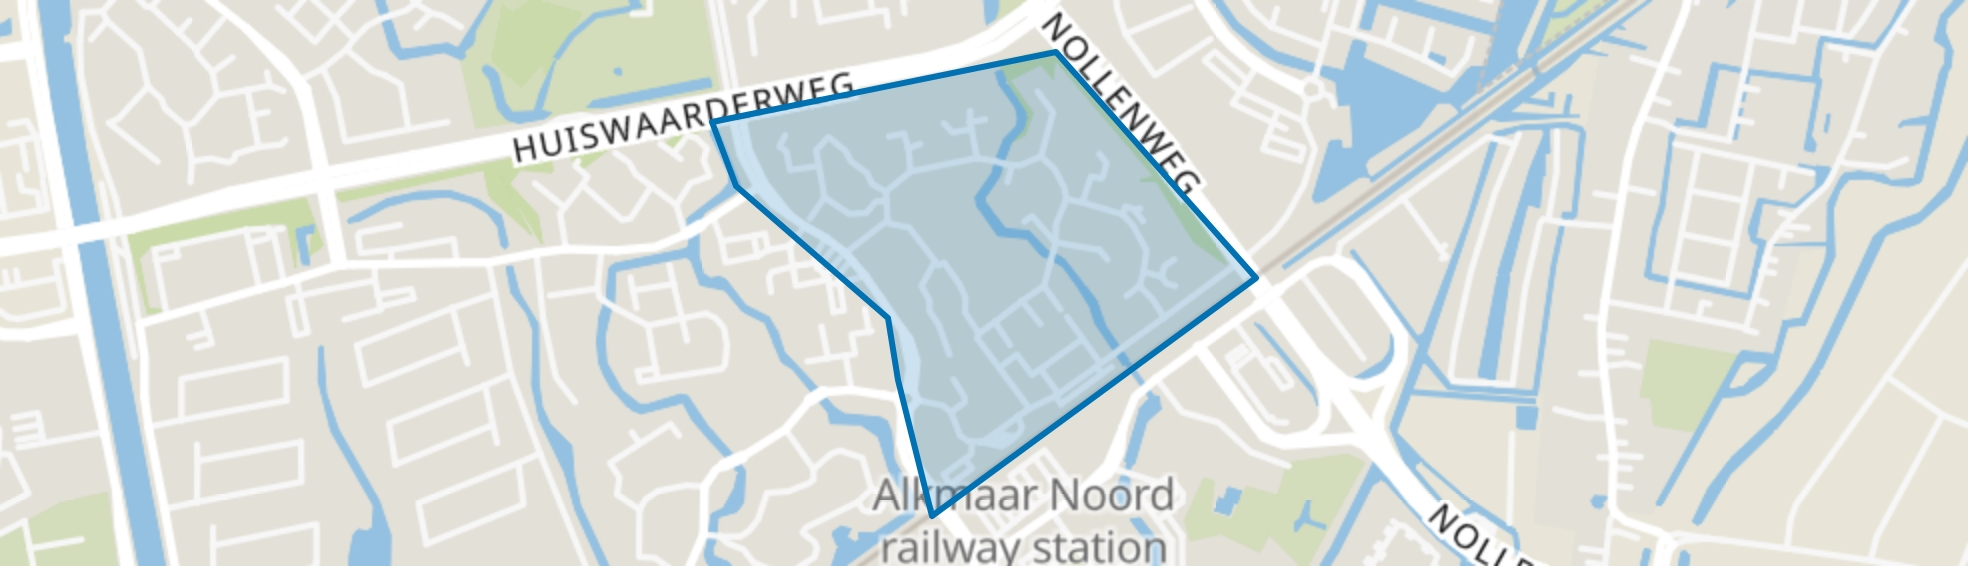 Huiswaard-2-Oost, Alkmaar map